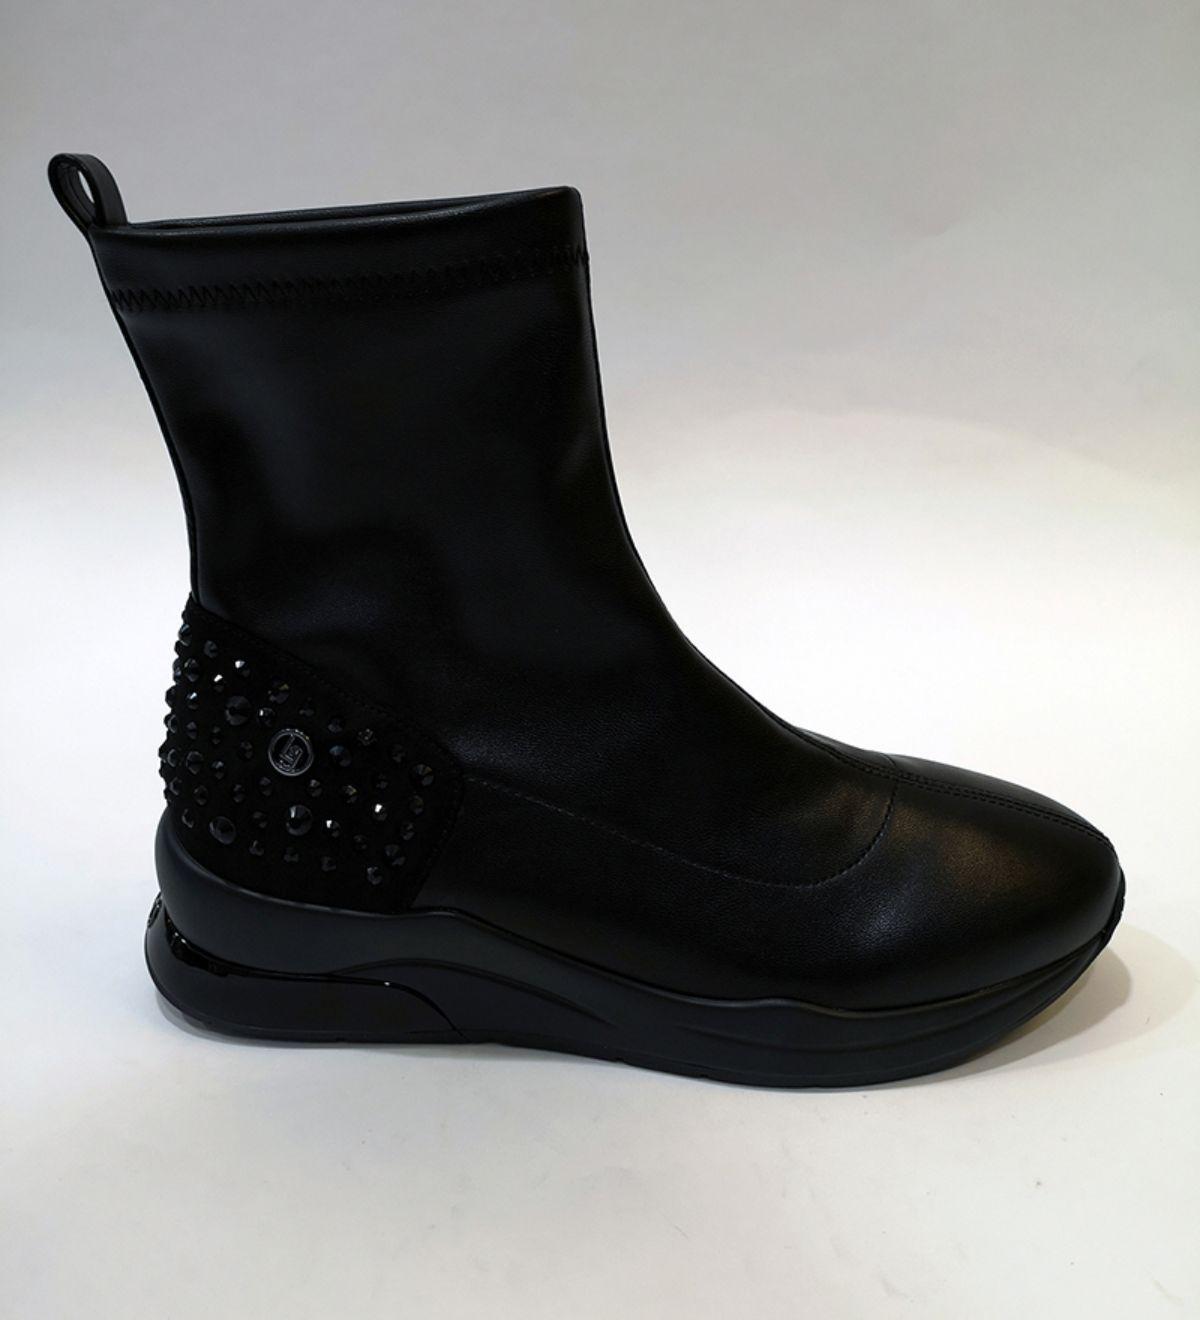 B69035-JX001 KARLIE 28 BOOTY BLACK 4